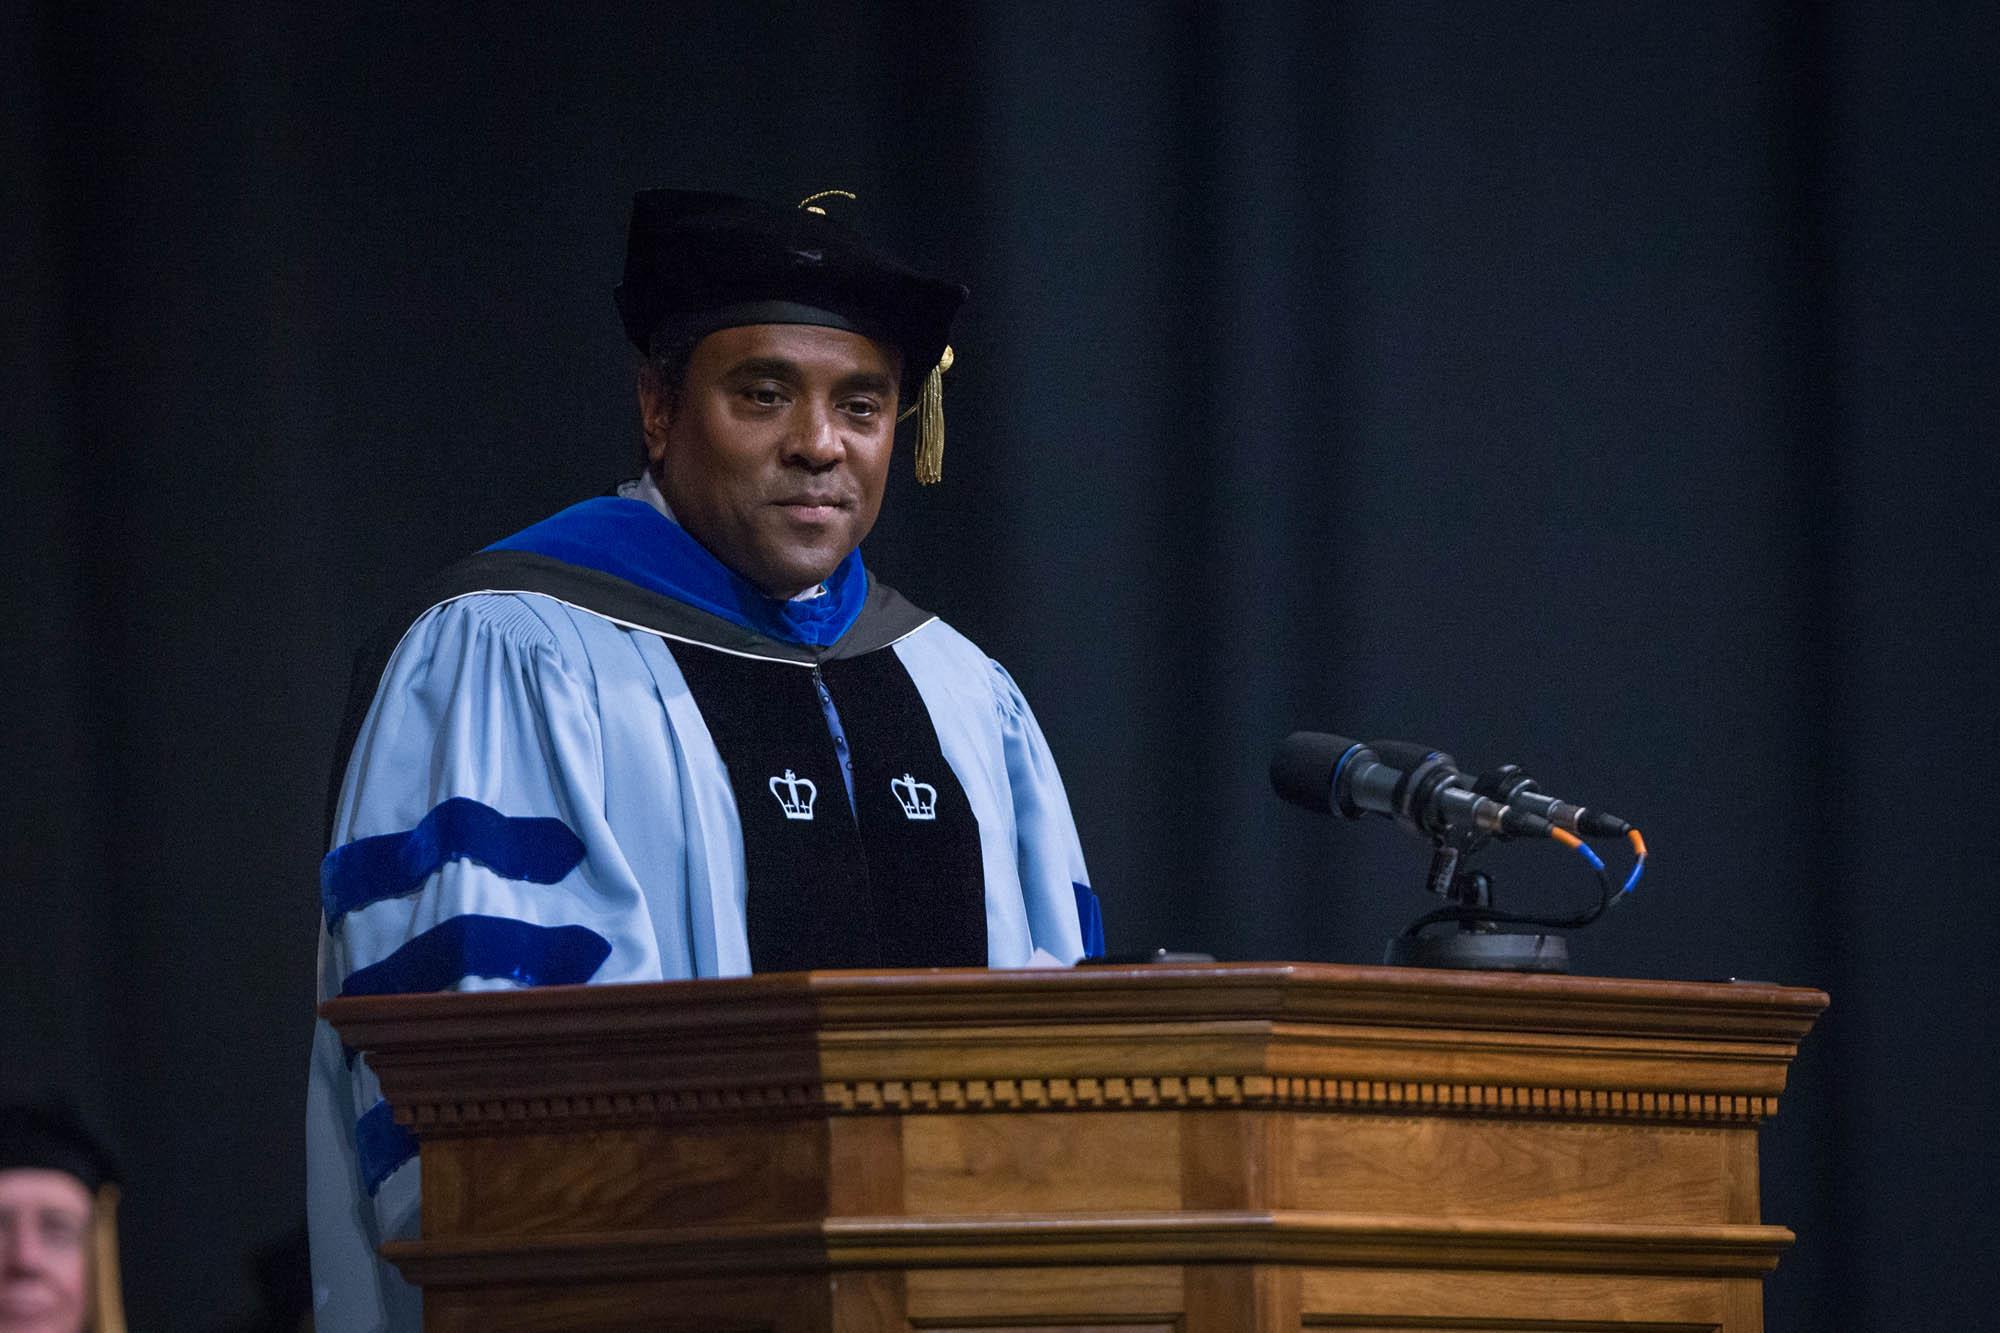 Professor Gregory Fairchild